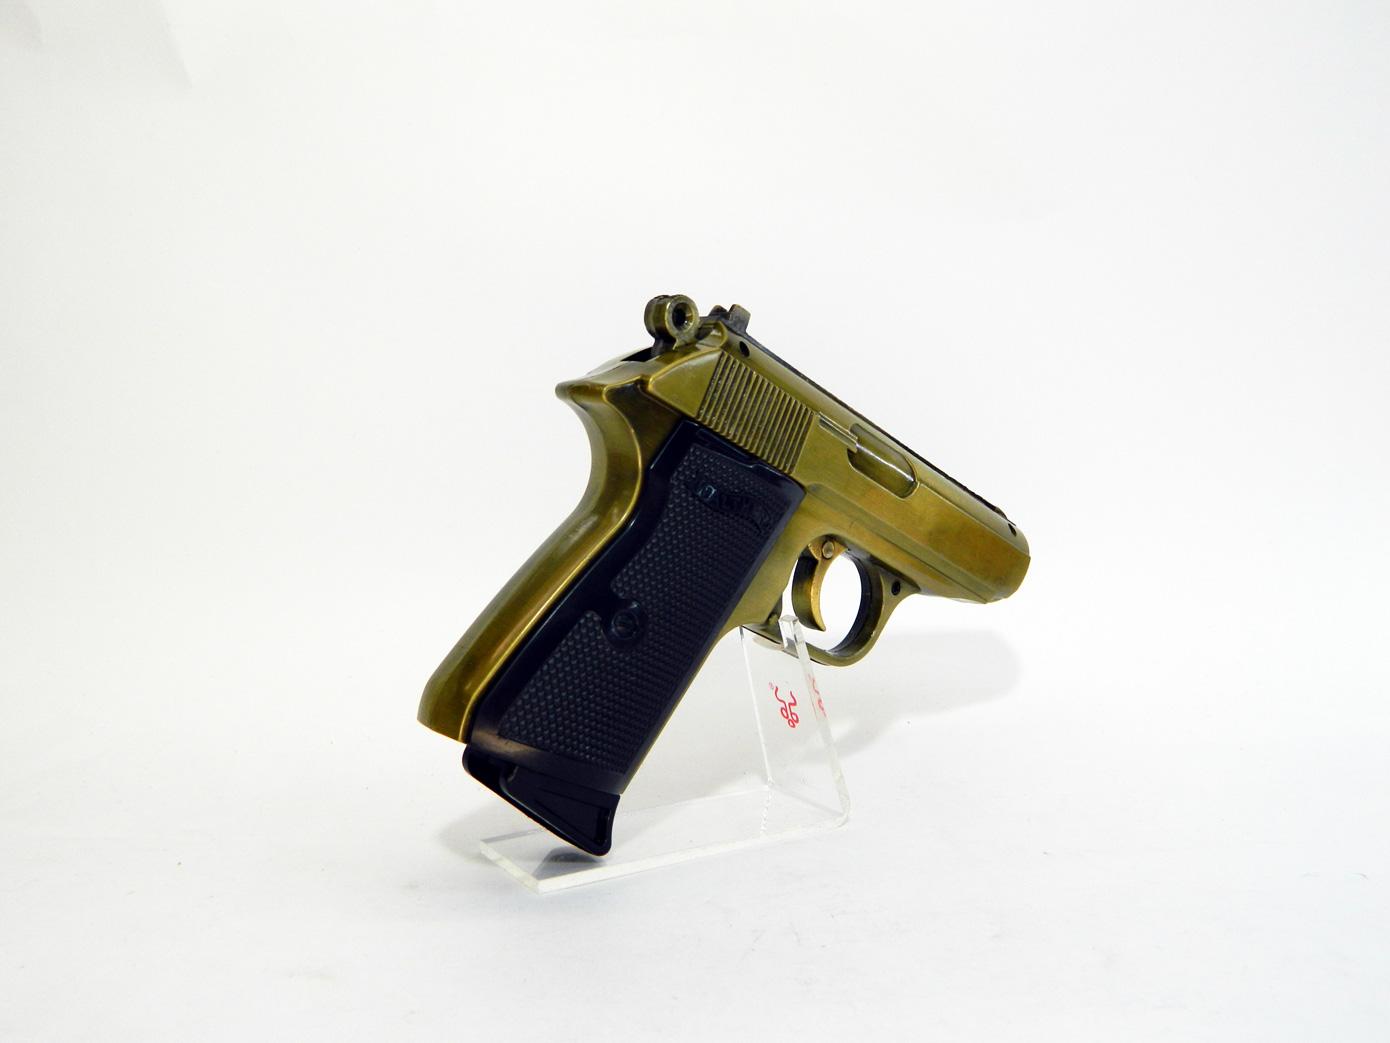 Пистолет Walther PPK/S бронза изображение 2